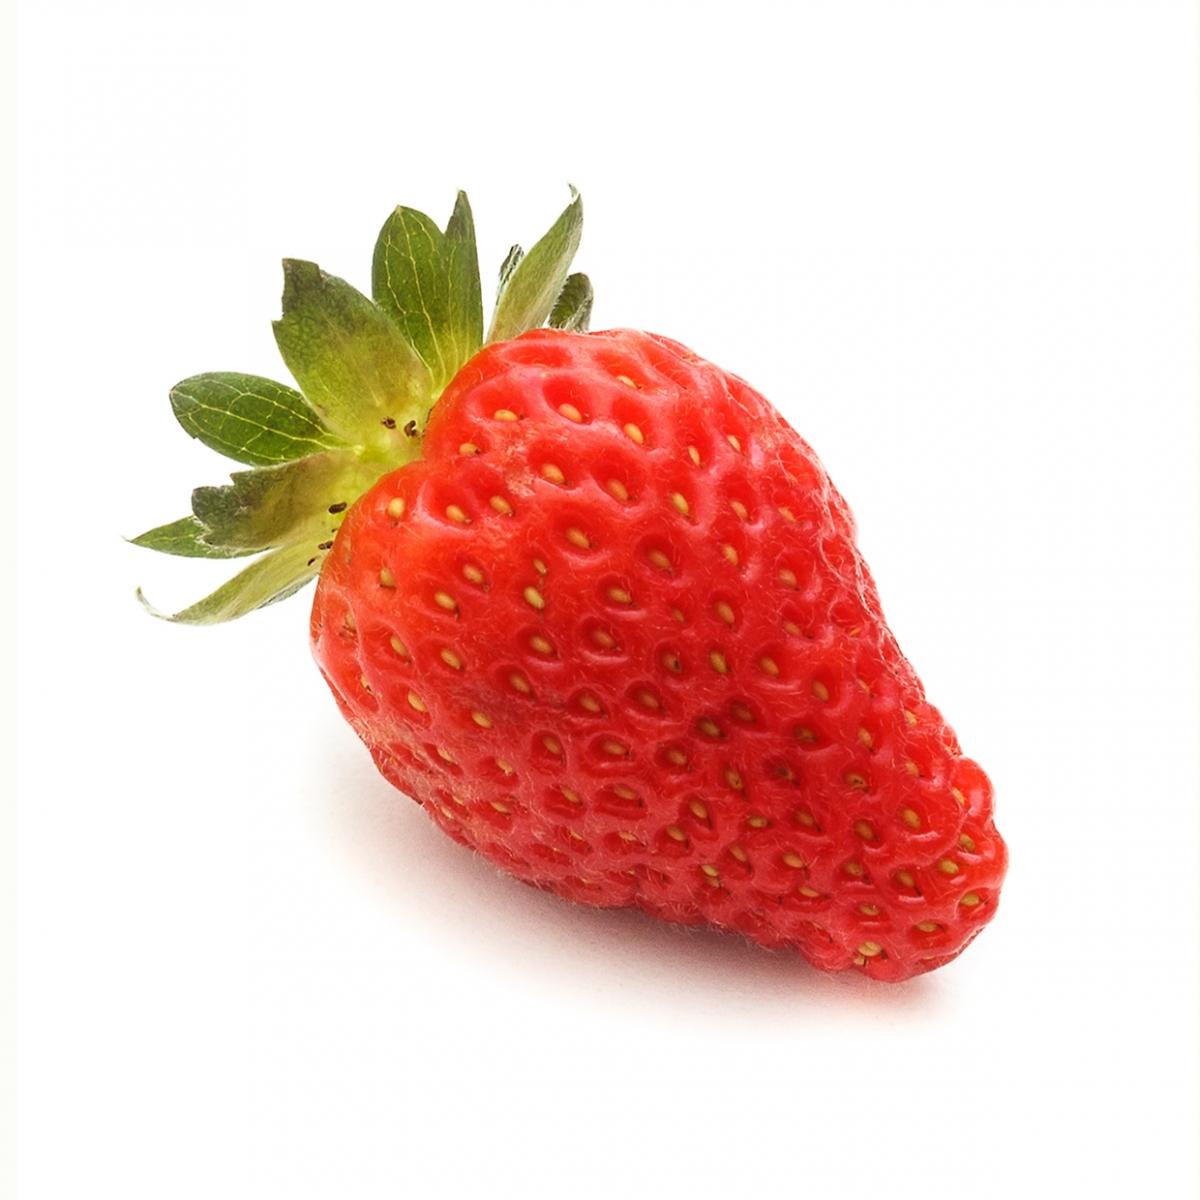 Imagen en la que se ve una fresa tumbada